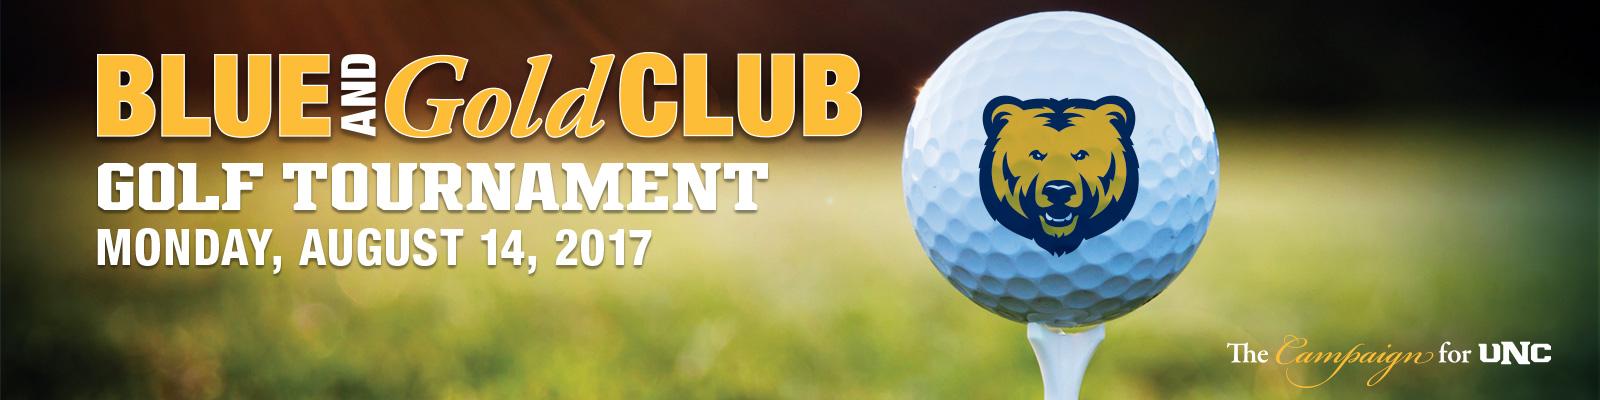 Blue and Gold Club Golf Tournament